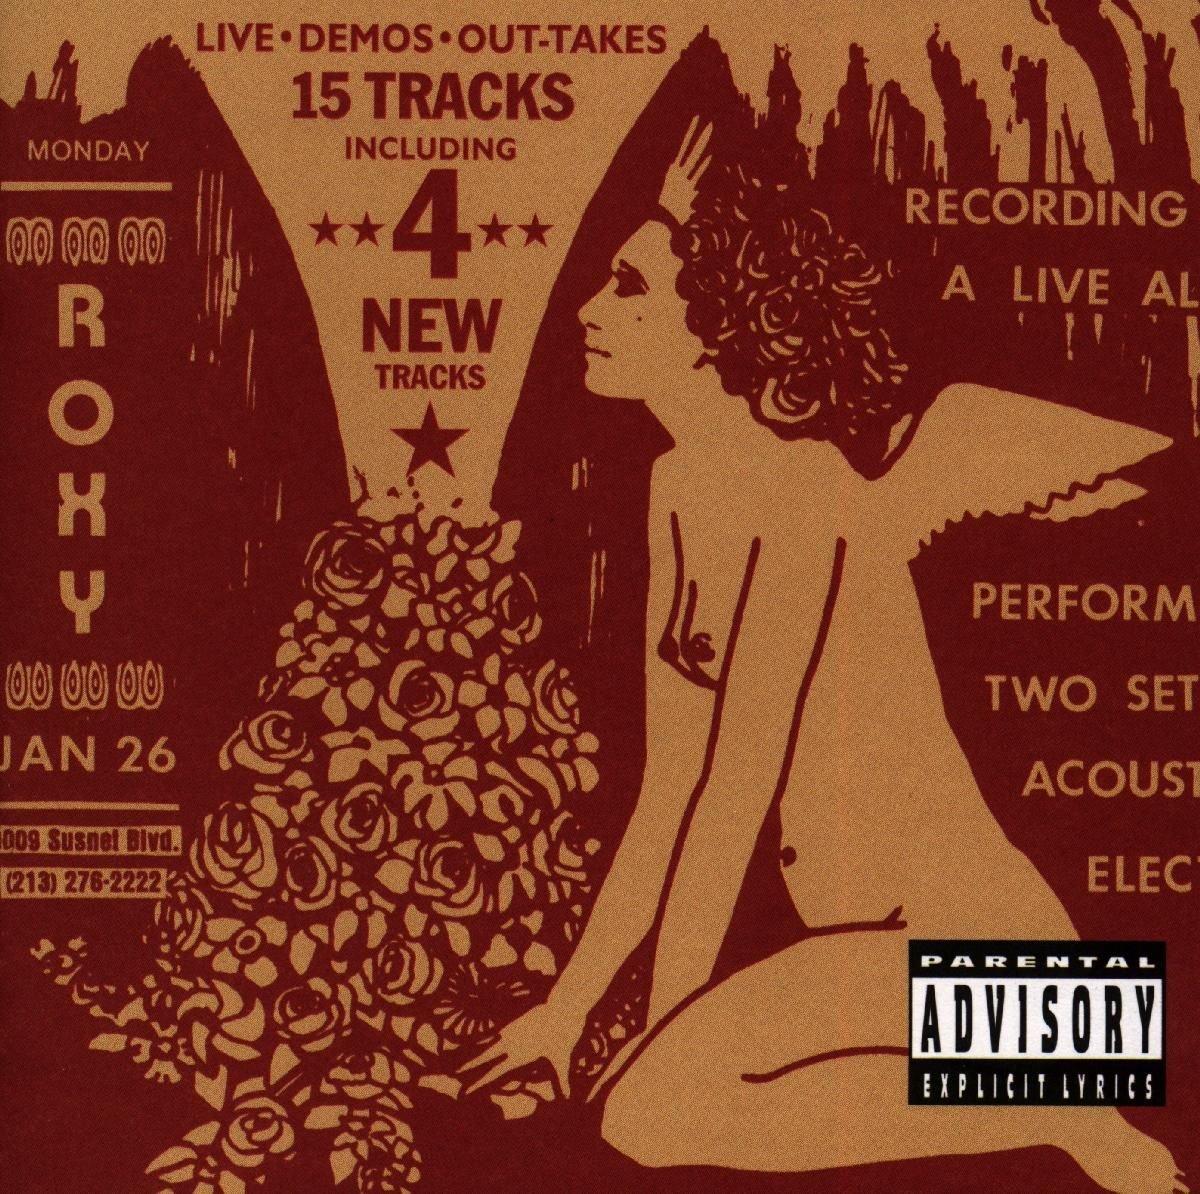 Jane's Addiction - Kettle Whistle - Amazon.com Music